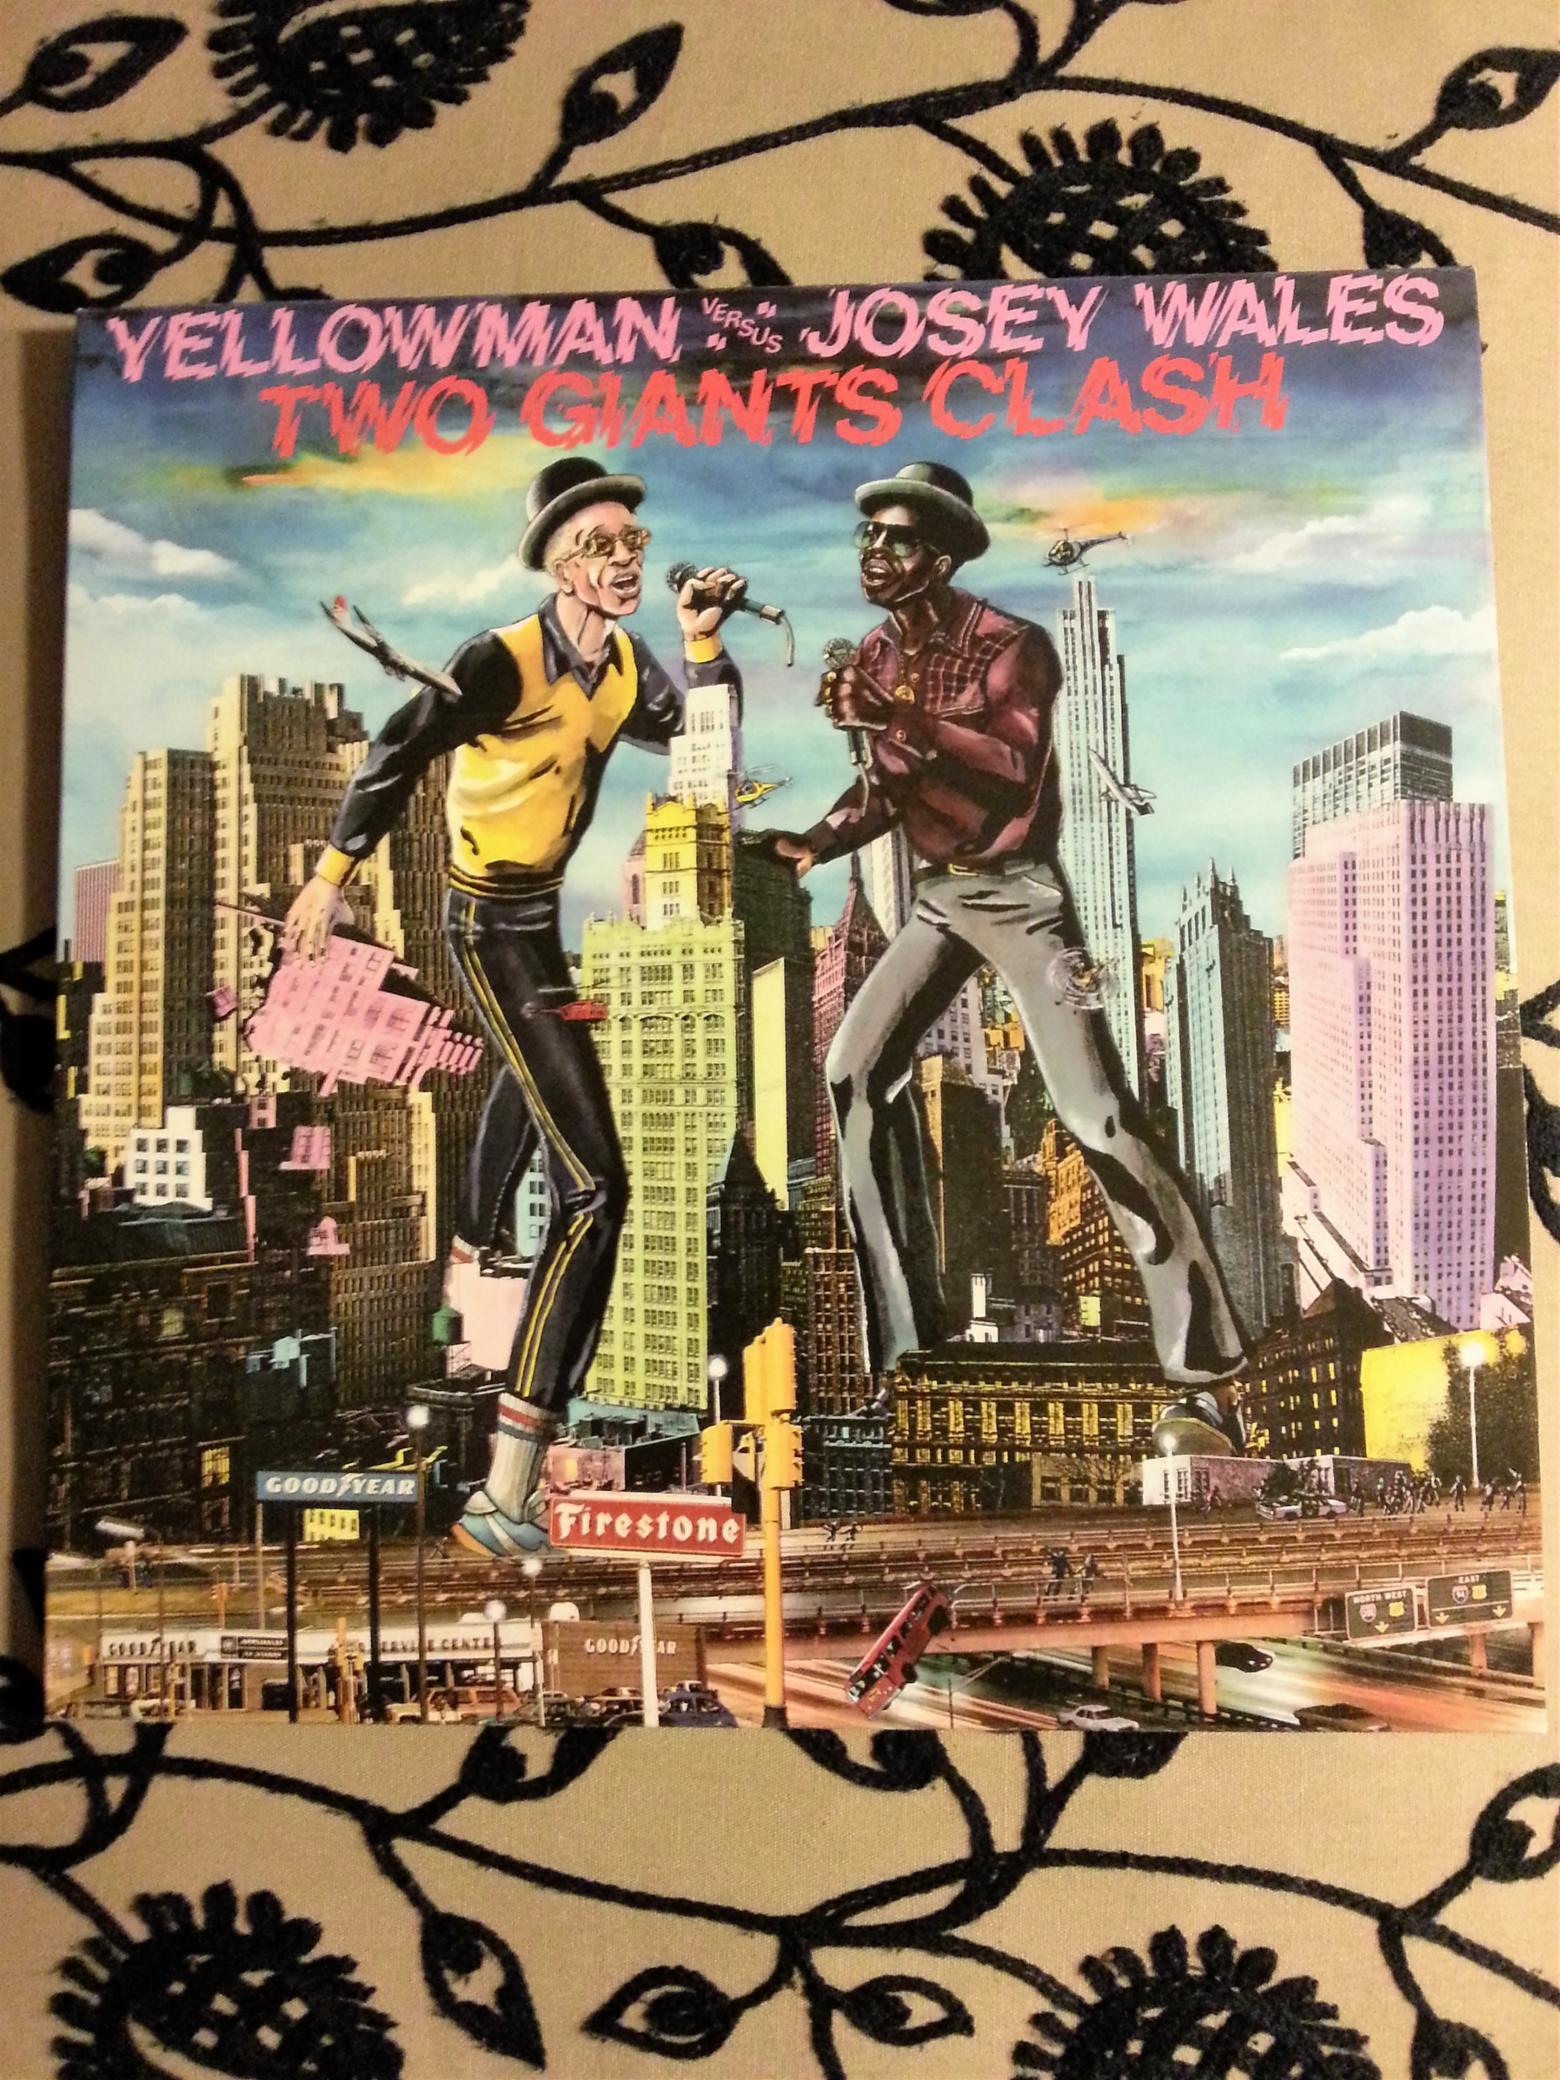 YELLOW MAN ET JOSEY WALES